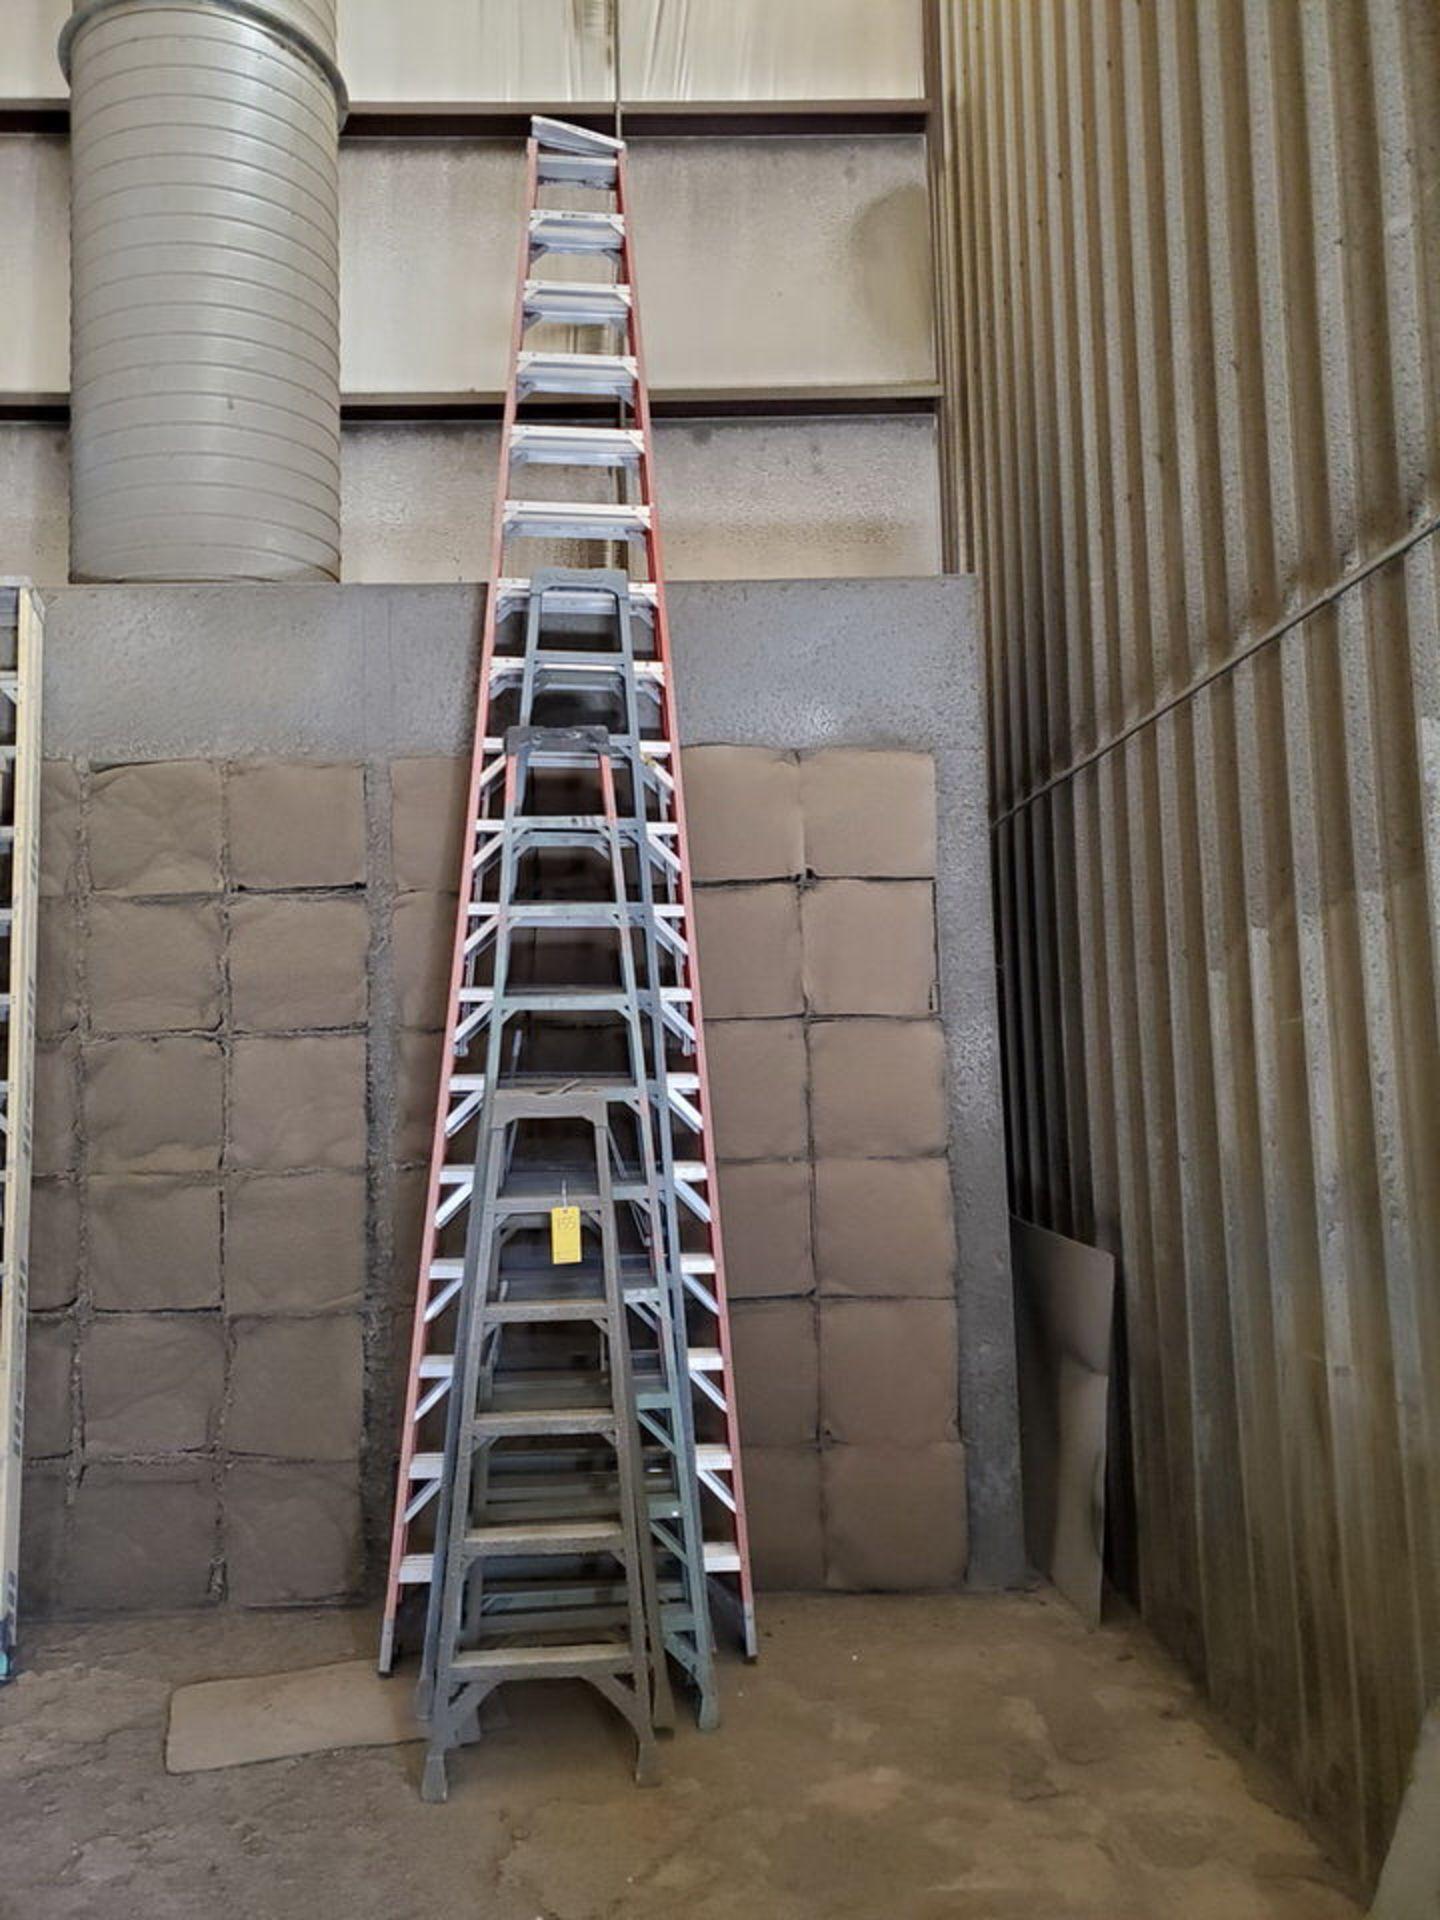 (4) Assorted Fiberglass Platform Ladders Sizes: 6', 10', 12', 18'